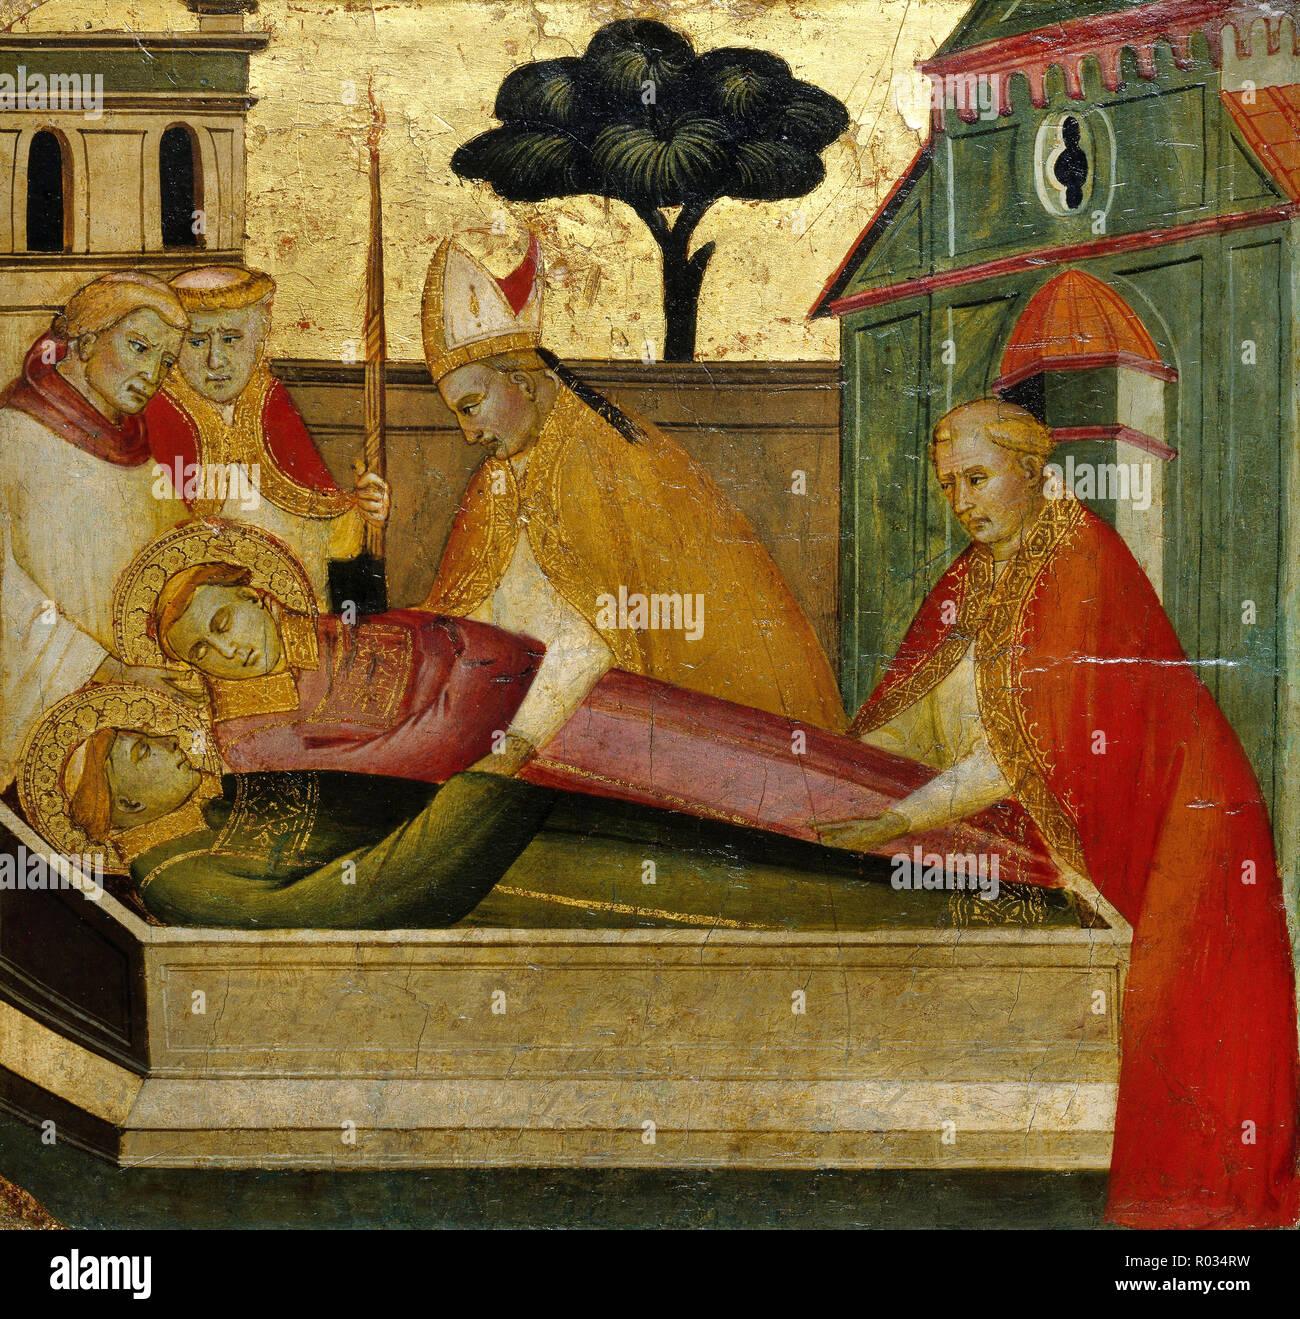 Lorenzo di Niccolo, Saint Lawrence Buried in Saint Stephens Tomb, Circa 1412, Tempera and tooled gold on poplar panel, Brooklyn Museum, New York City, USA. - Stock Image